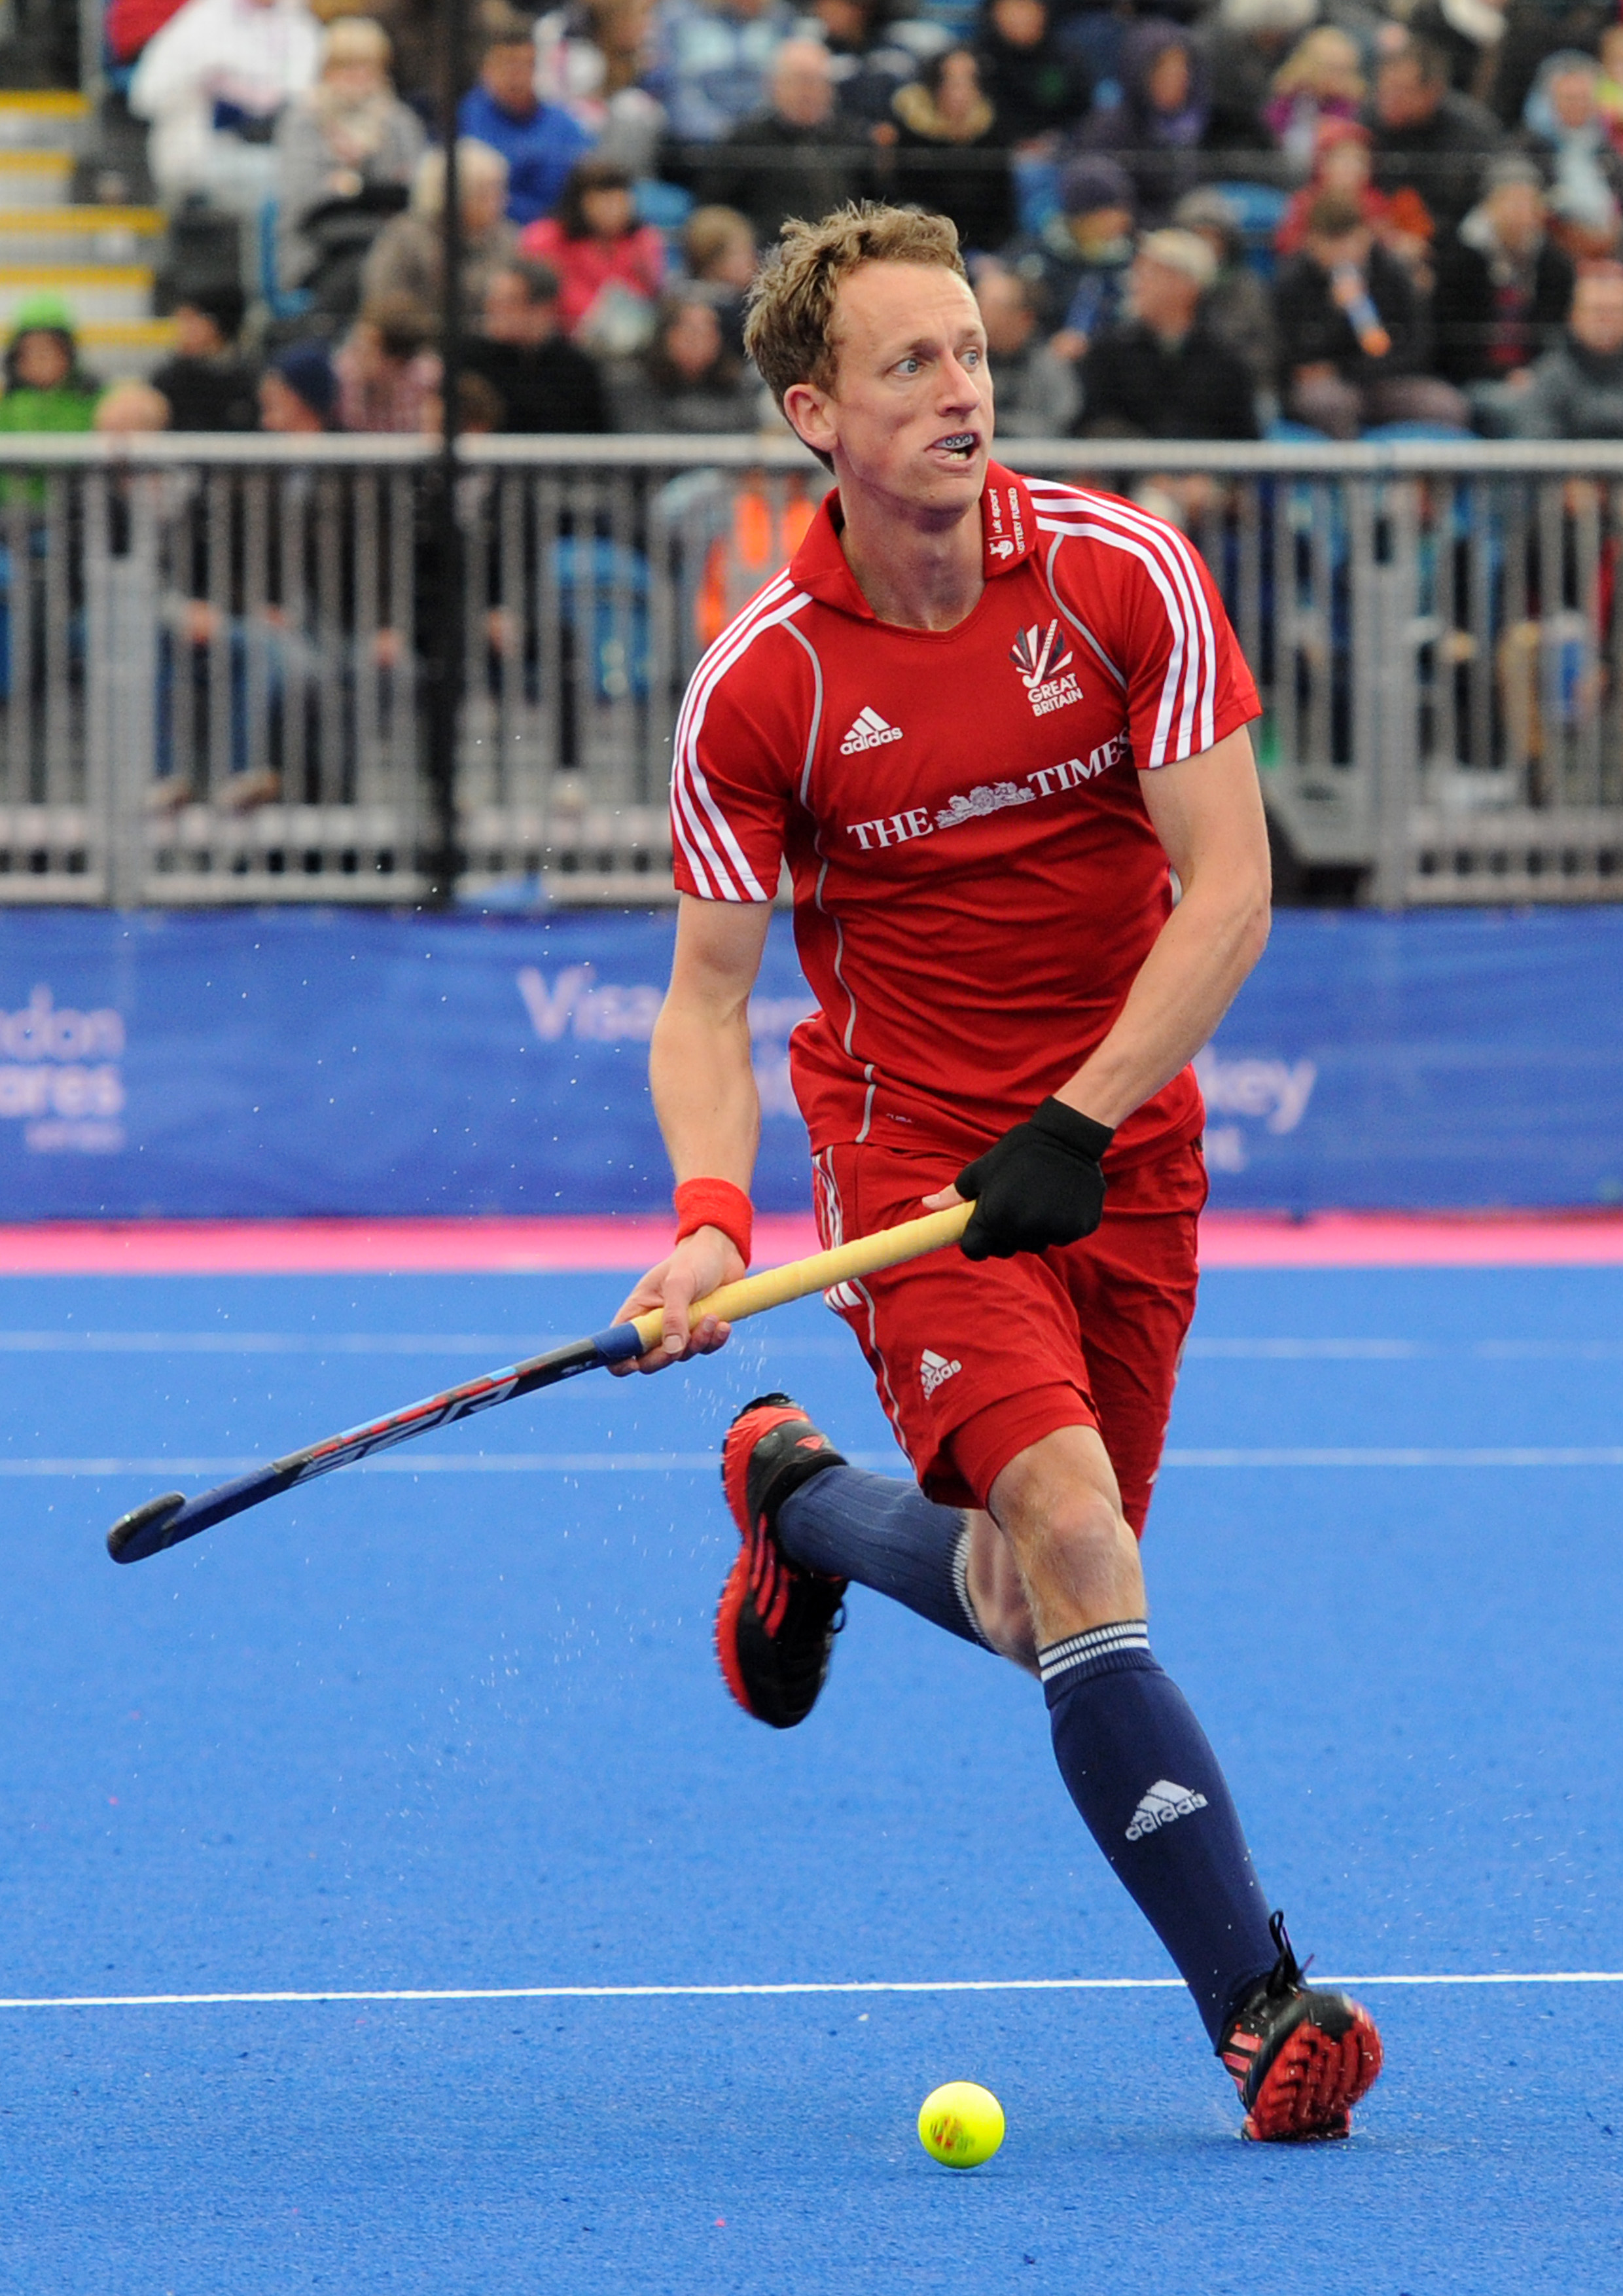 Dan Fox (c) Andy Smith